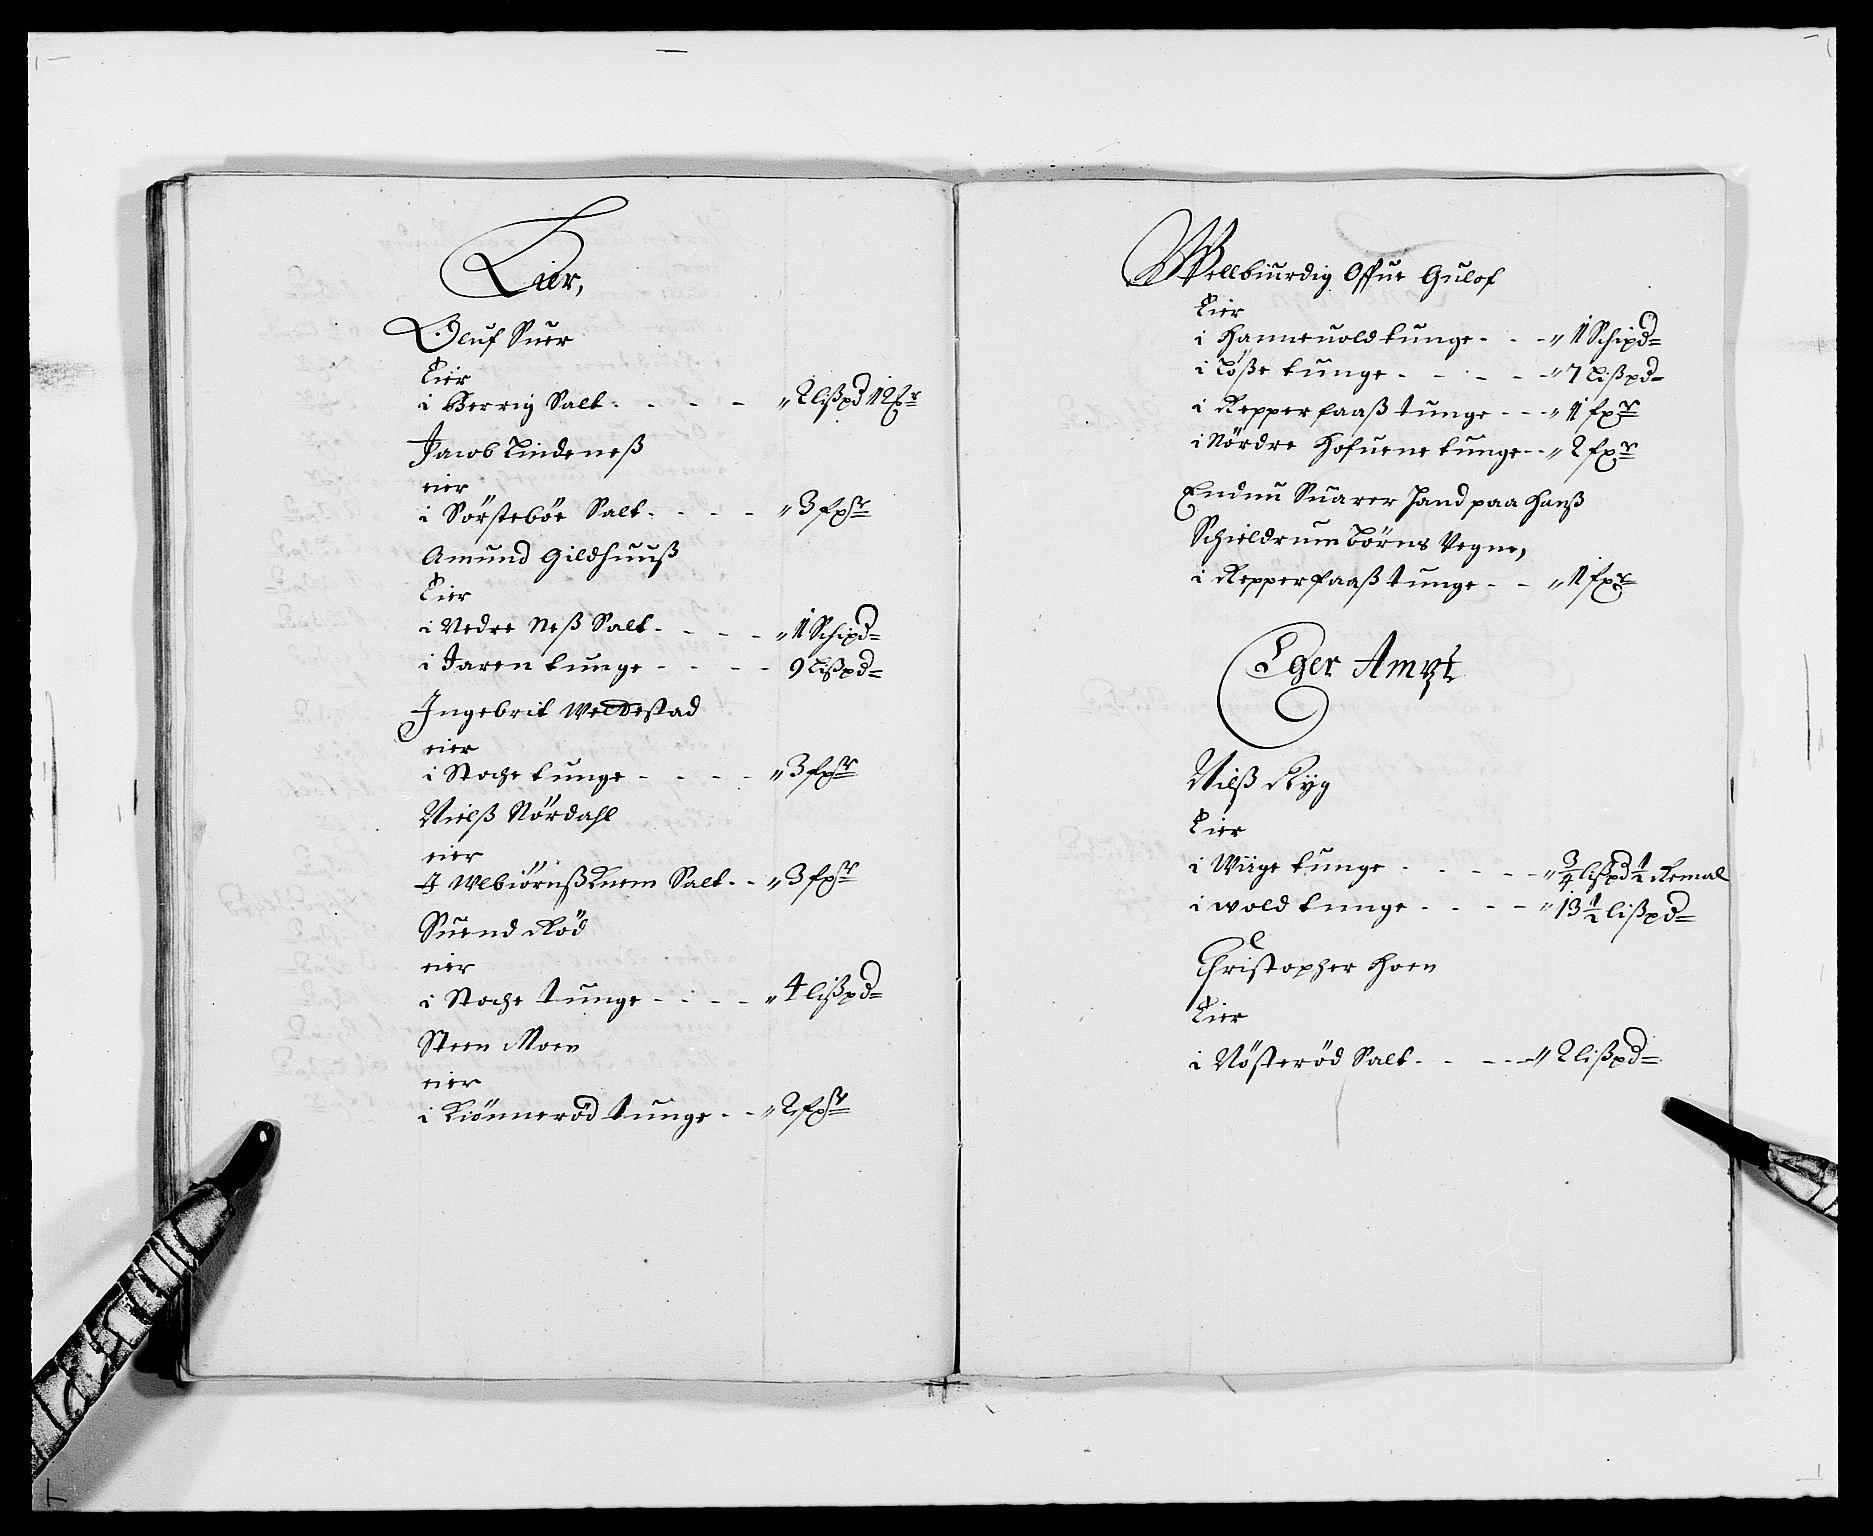 RA, Rentekammeret inntil 1814, Reviderte regnskaper, Fogderegnskap, R32/L1857: Fogderegnskap Jarlsberg grevskap, 1686-1690, s. 240